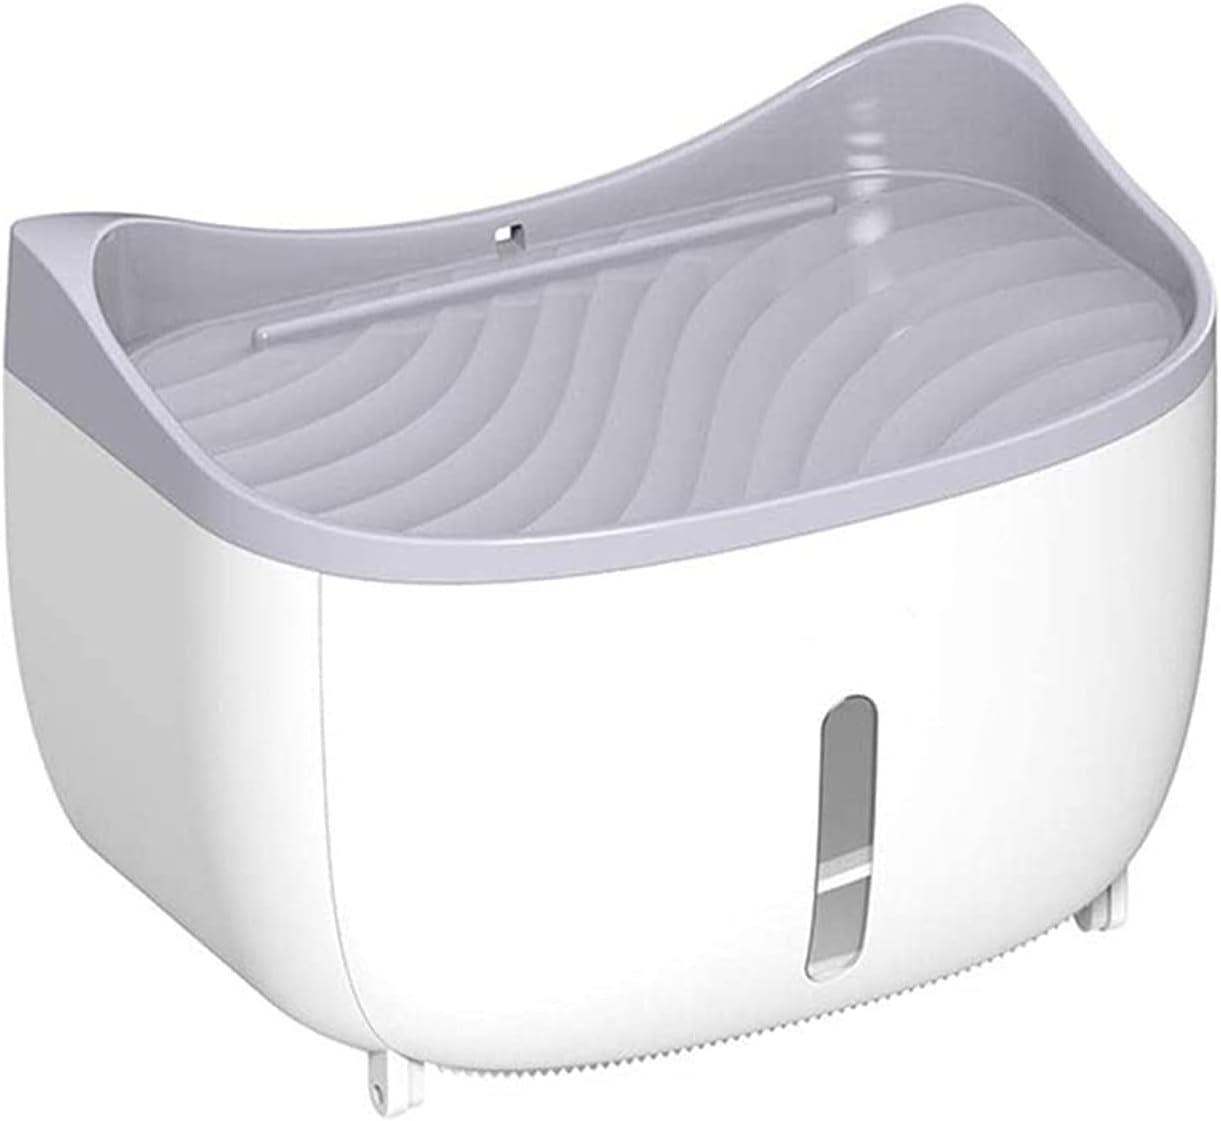 Xiaoli Toilet shopping Paper Storage P Tissue Holder Holders shopping